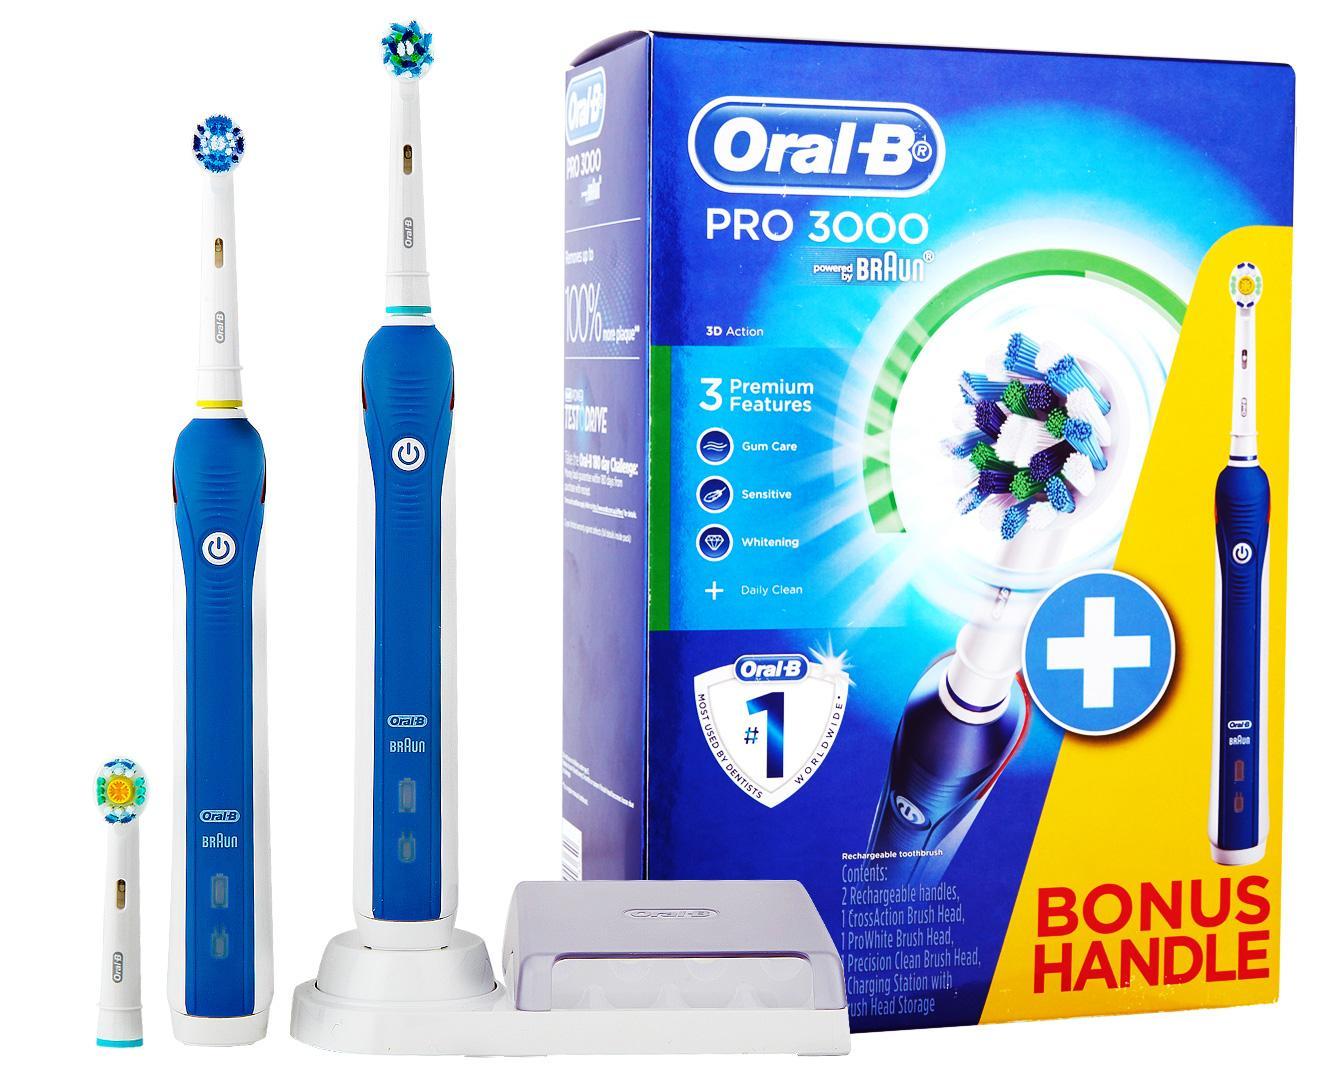 Oral B Pro 3000 Power Toothbrush Kit Bonus Handle Reviews